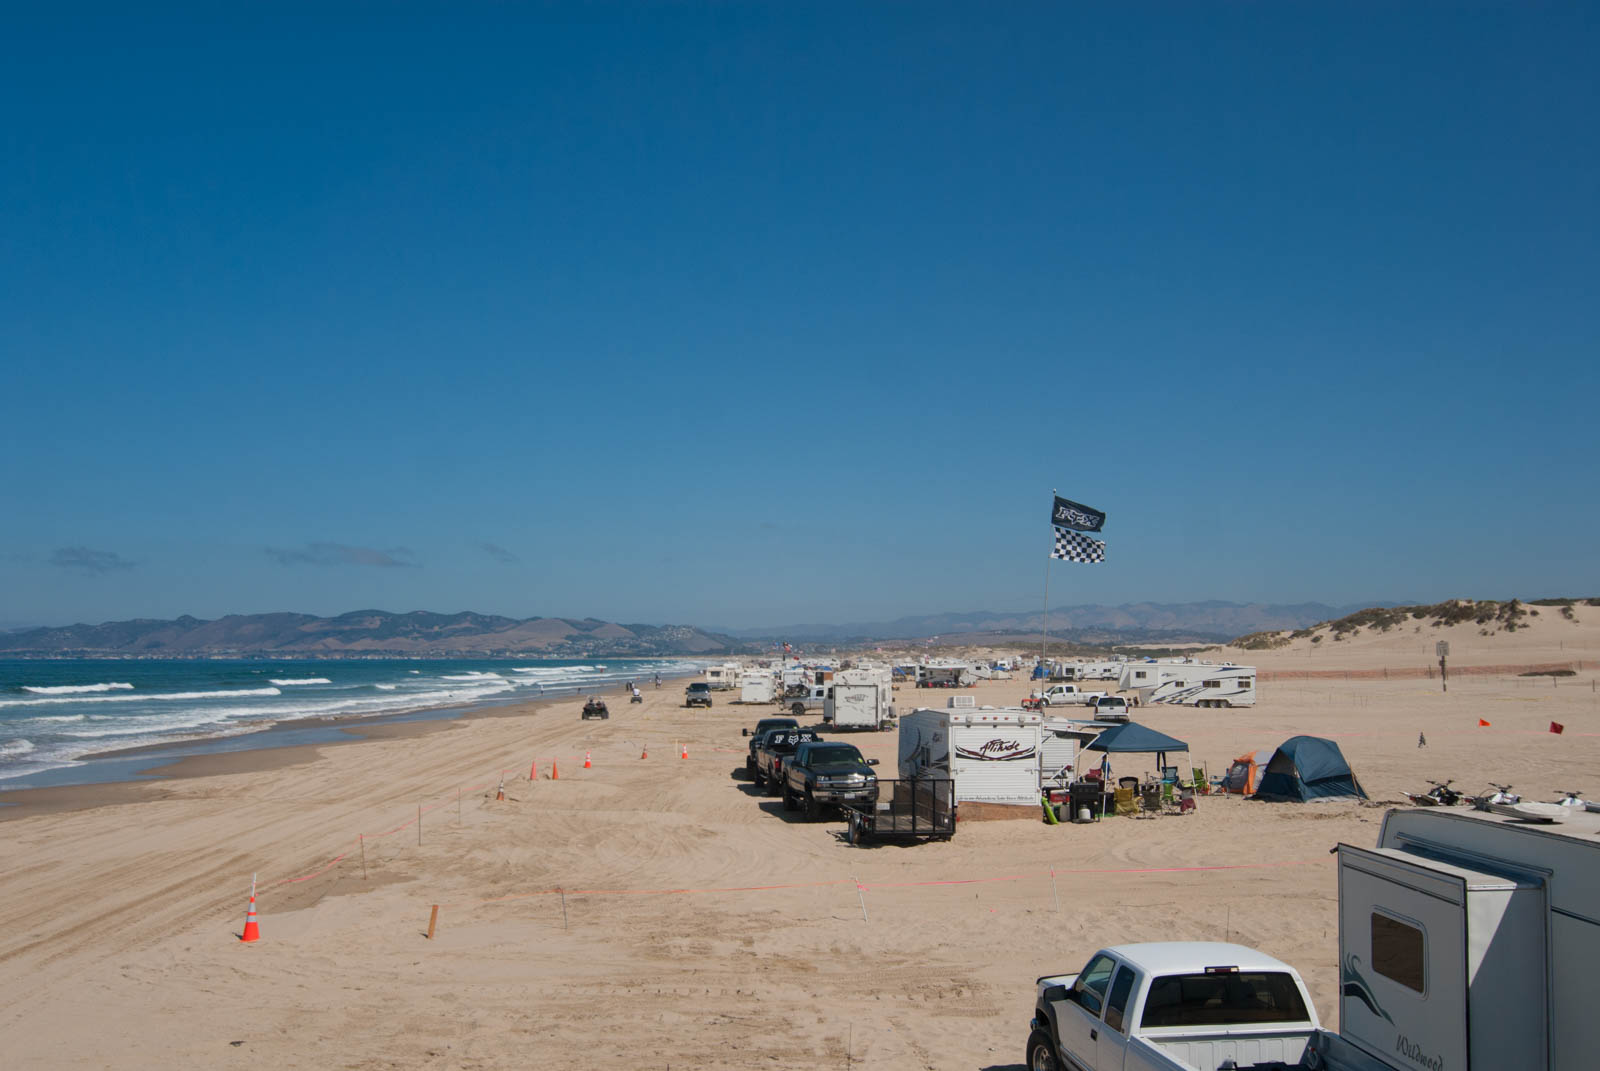 Pismo-beach_DSC_3833-2.jpg